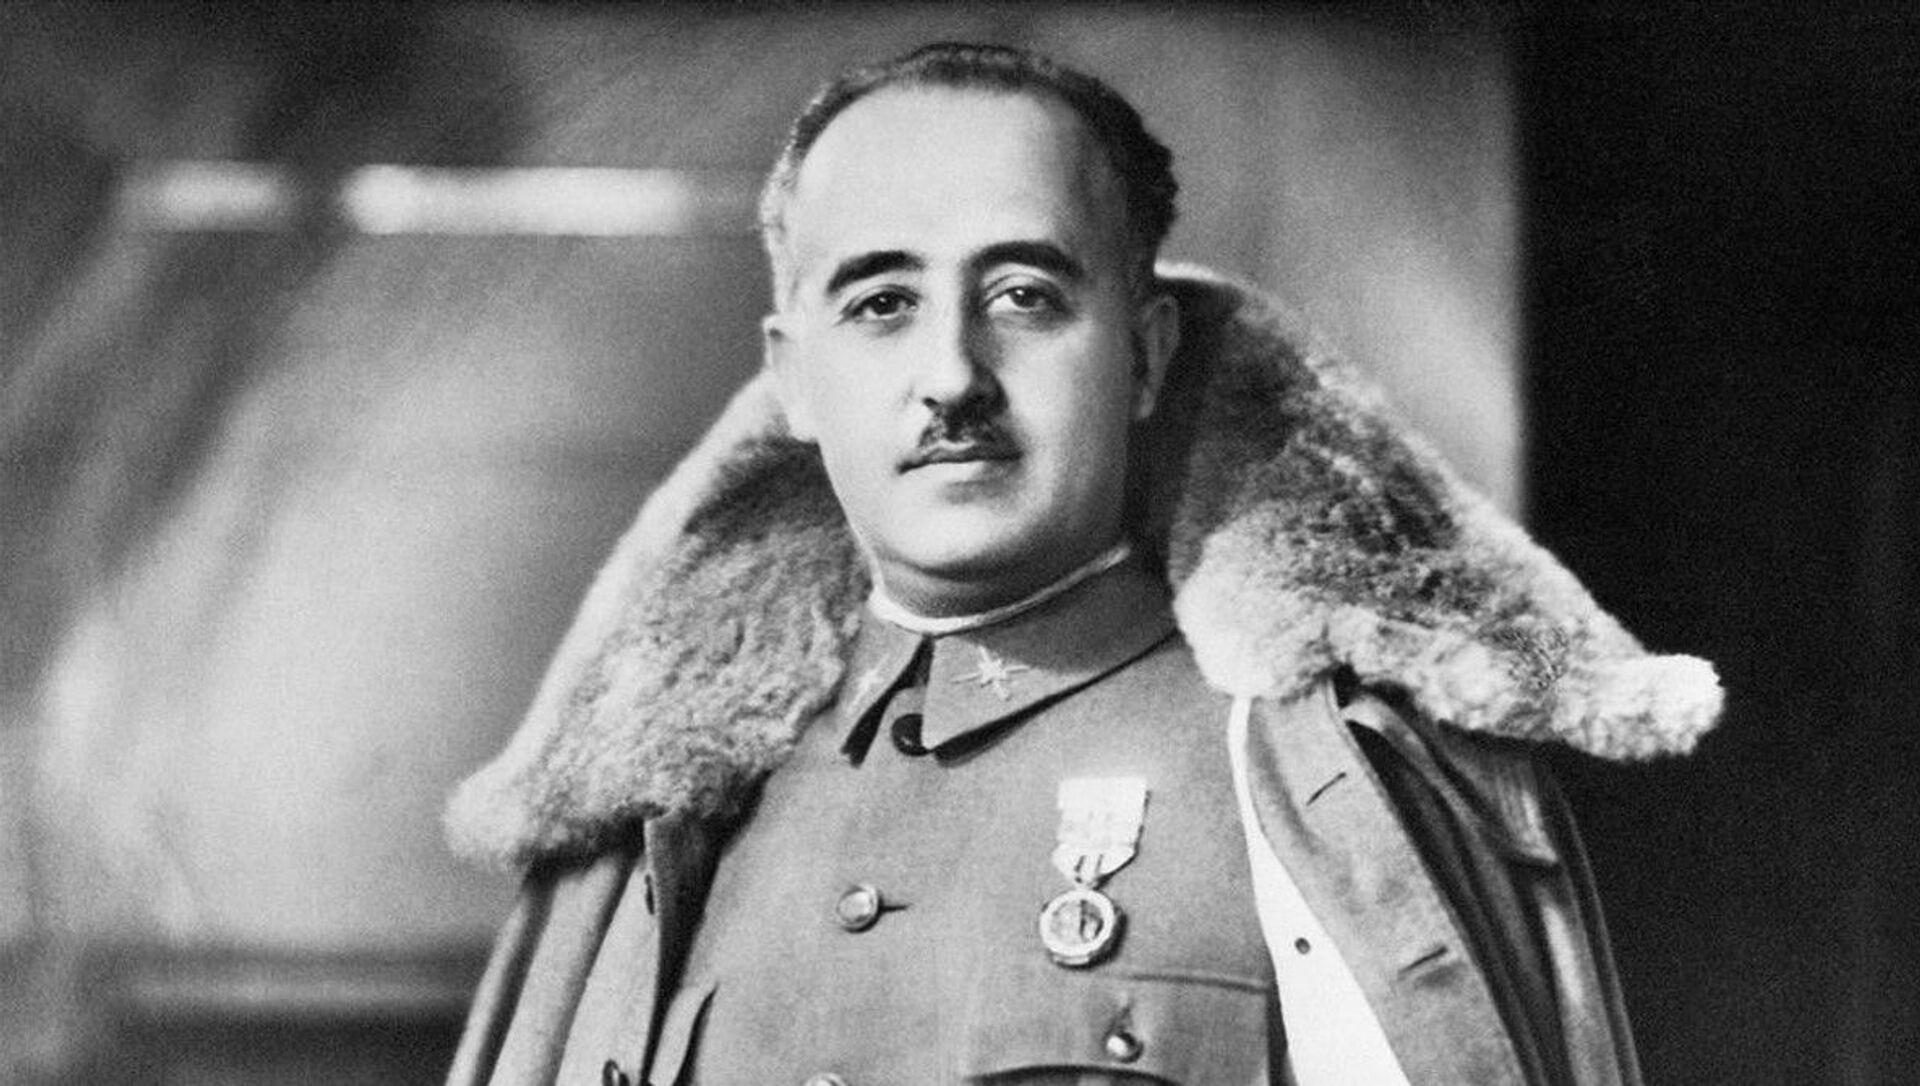 Perché in Spagna sta prosperando l'estrema destra? - Sputnik Italia, 1920, 21.03.2021